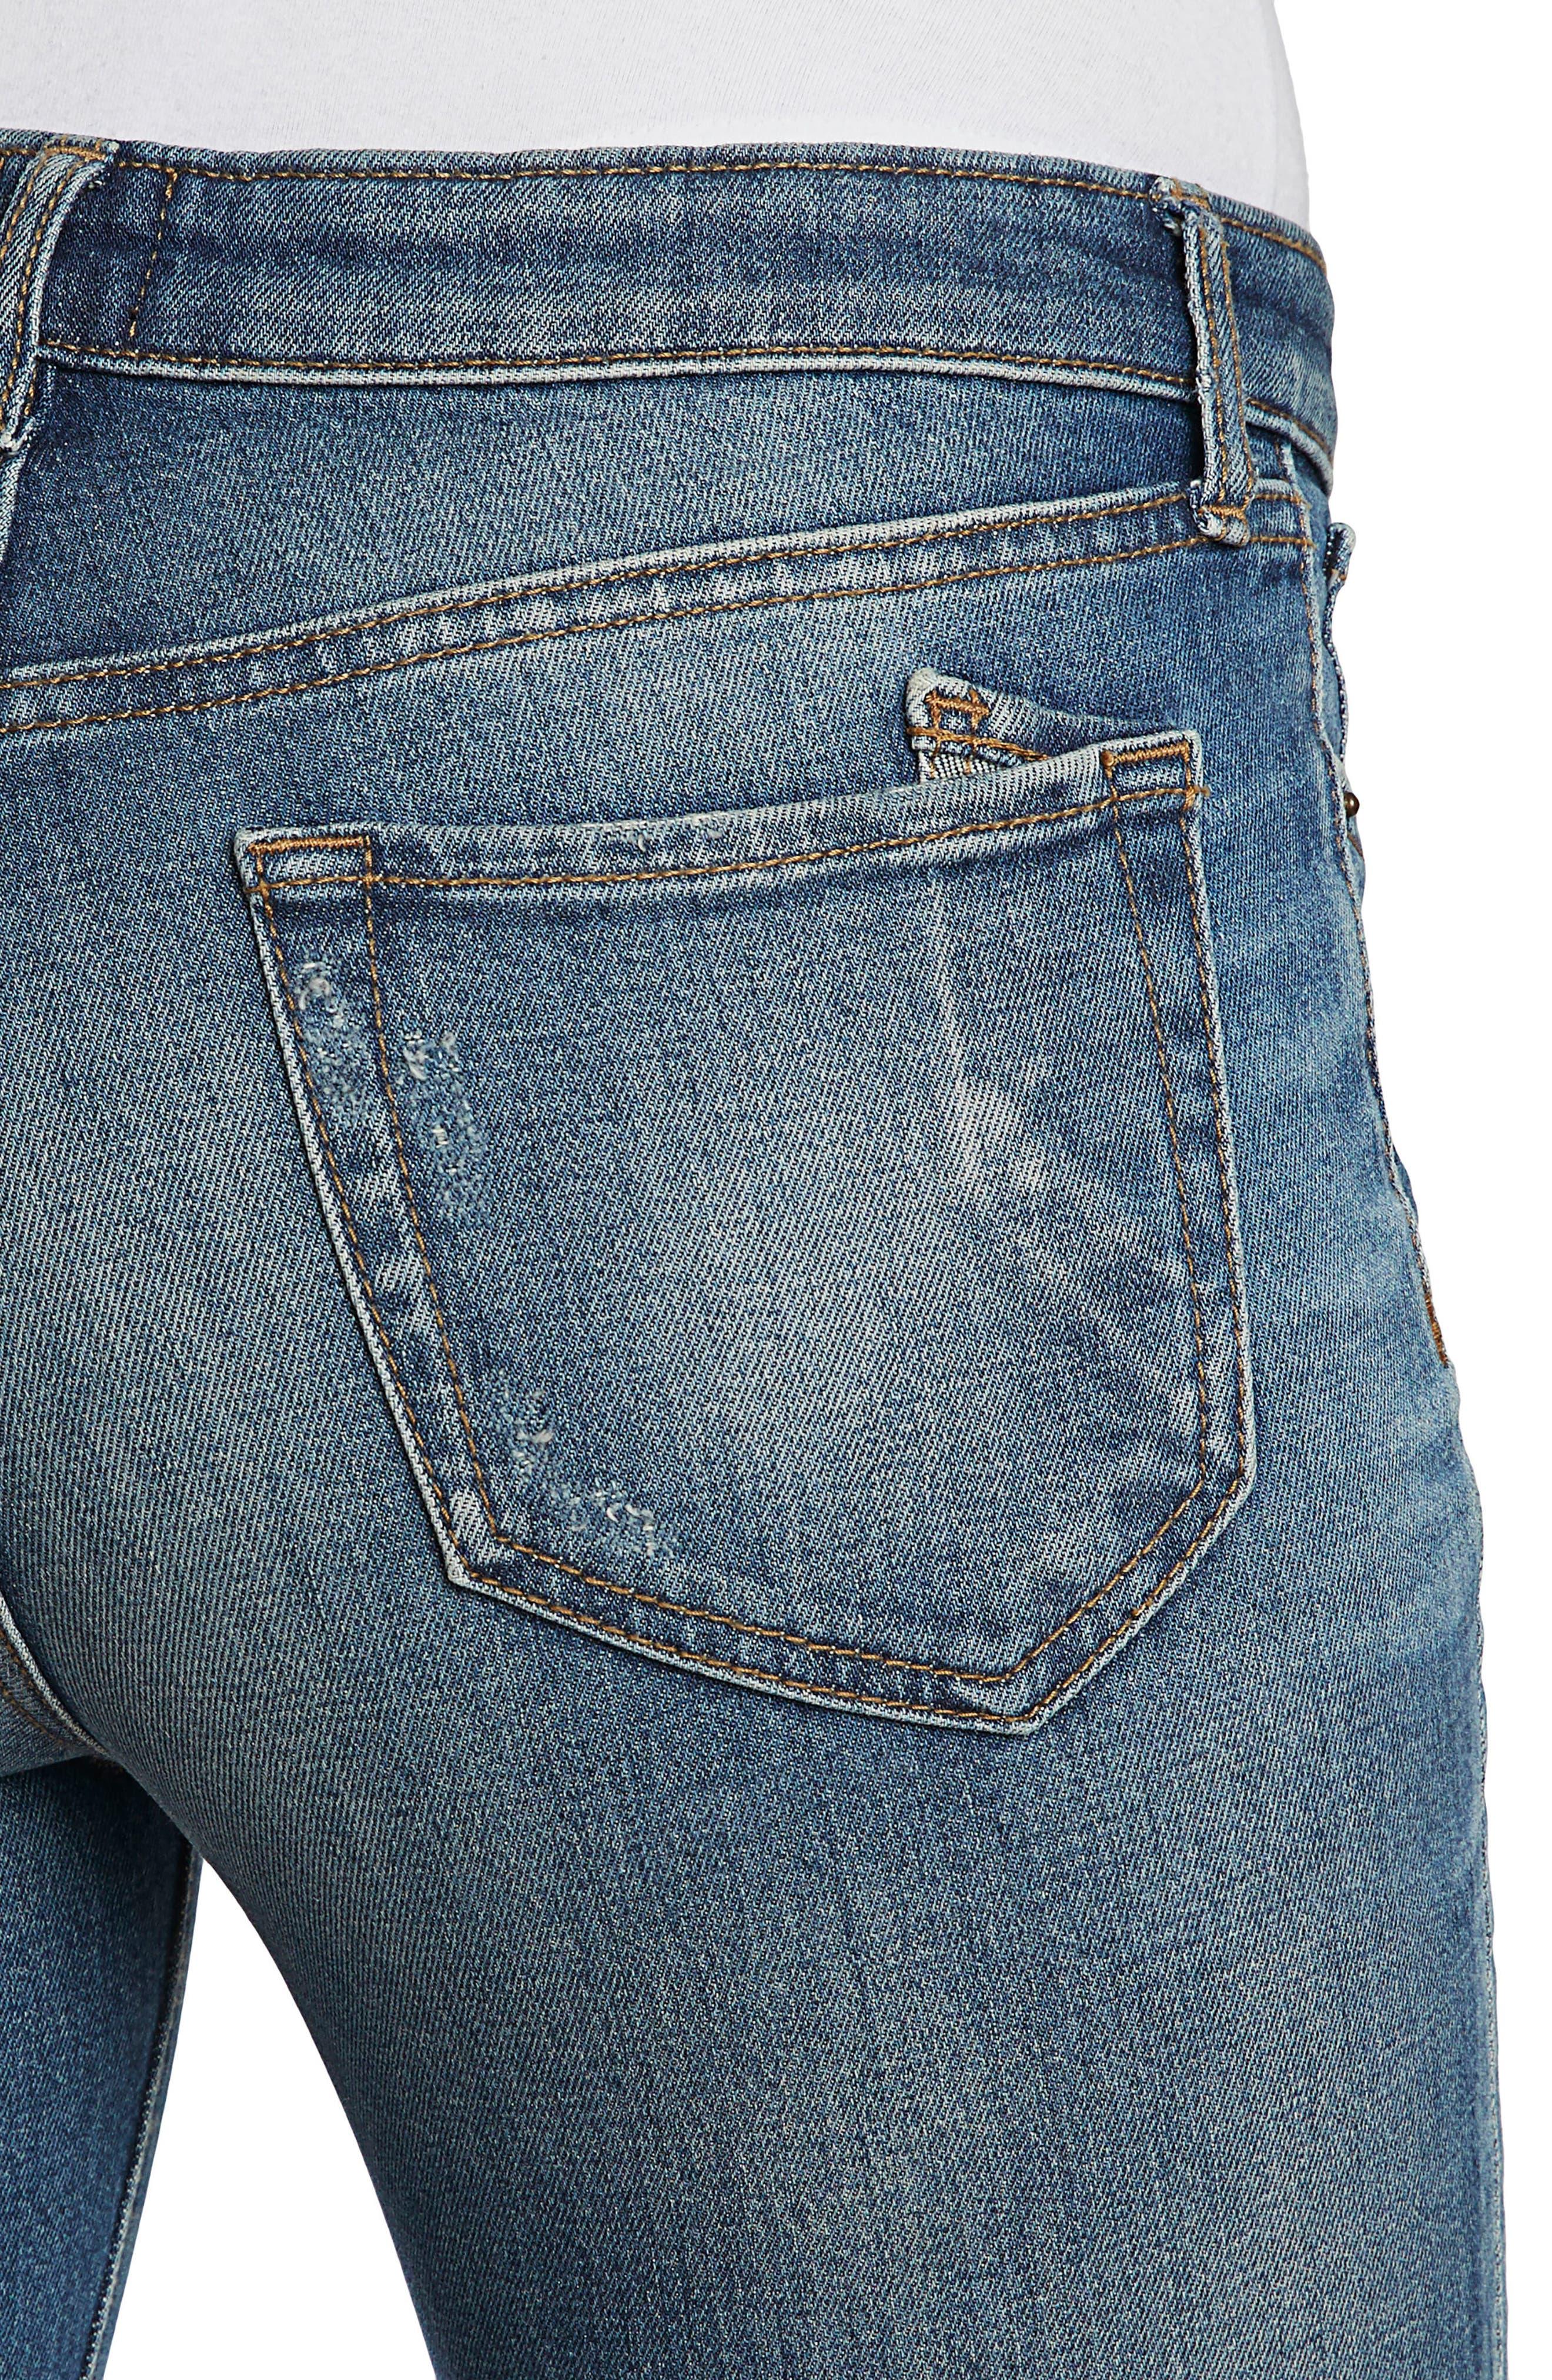 Camaro Ankle Skinny Jeans,                             Alternate thumbnail 4, color,                             490